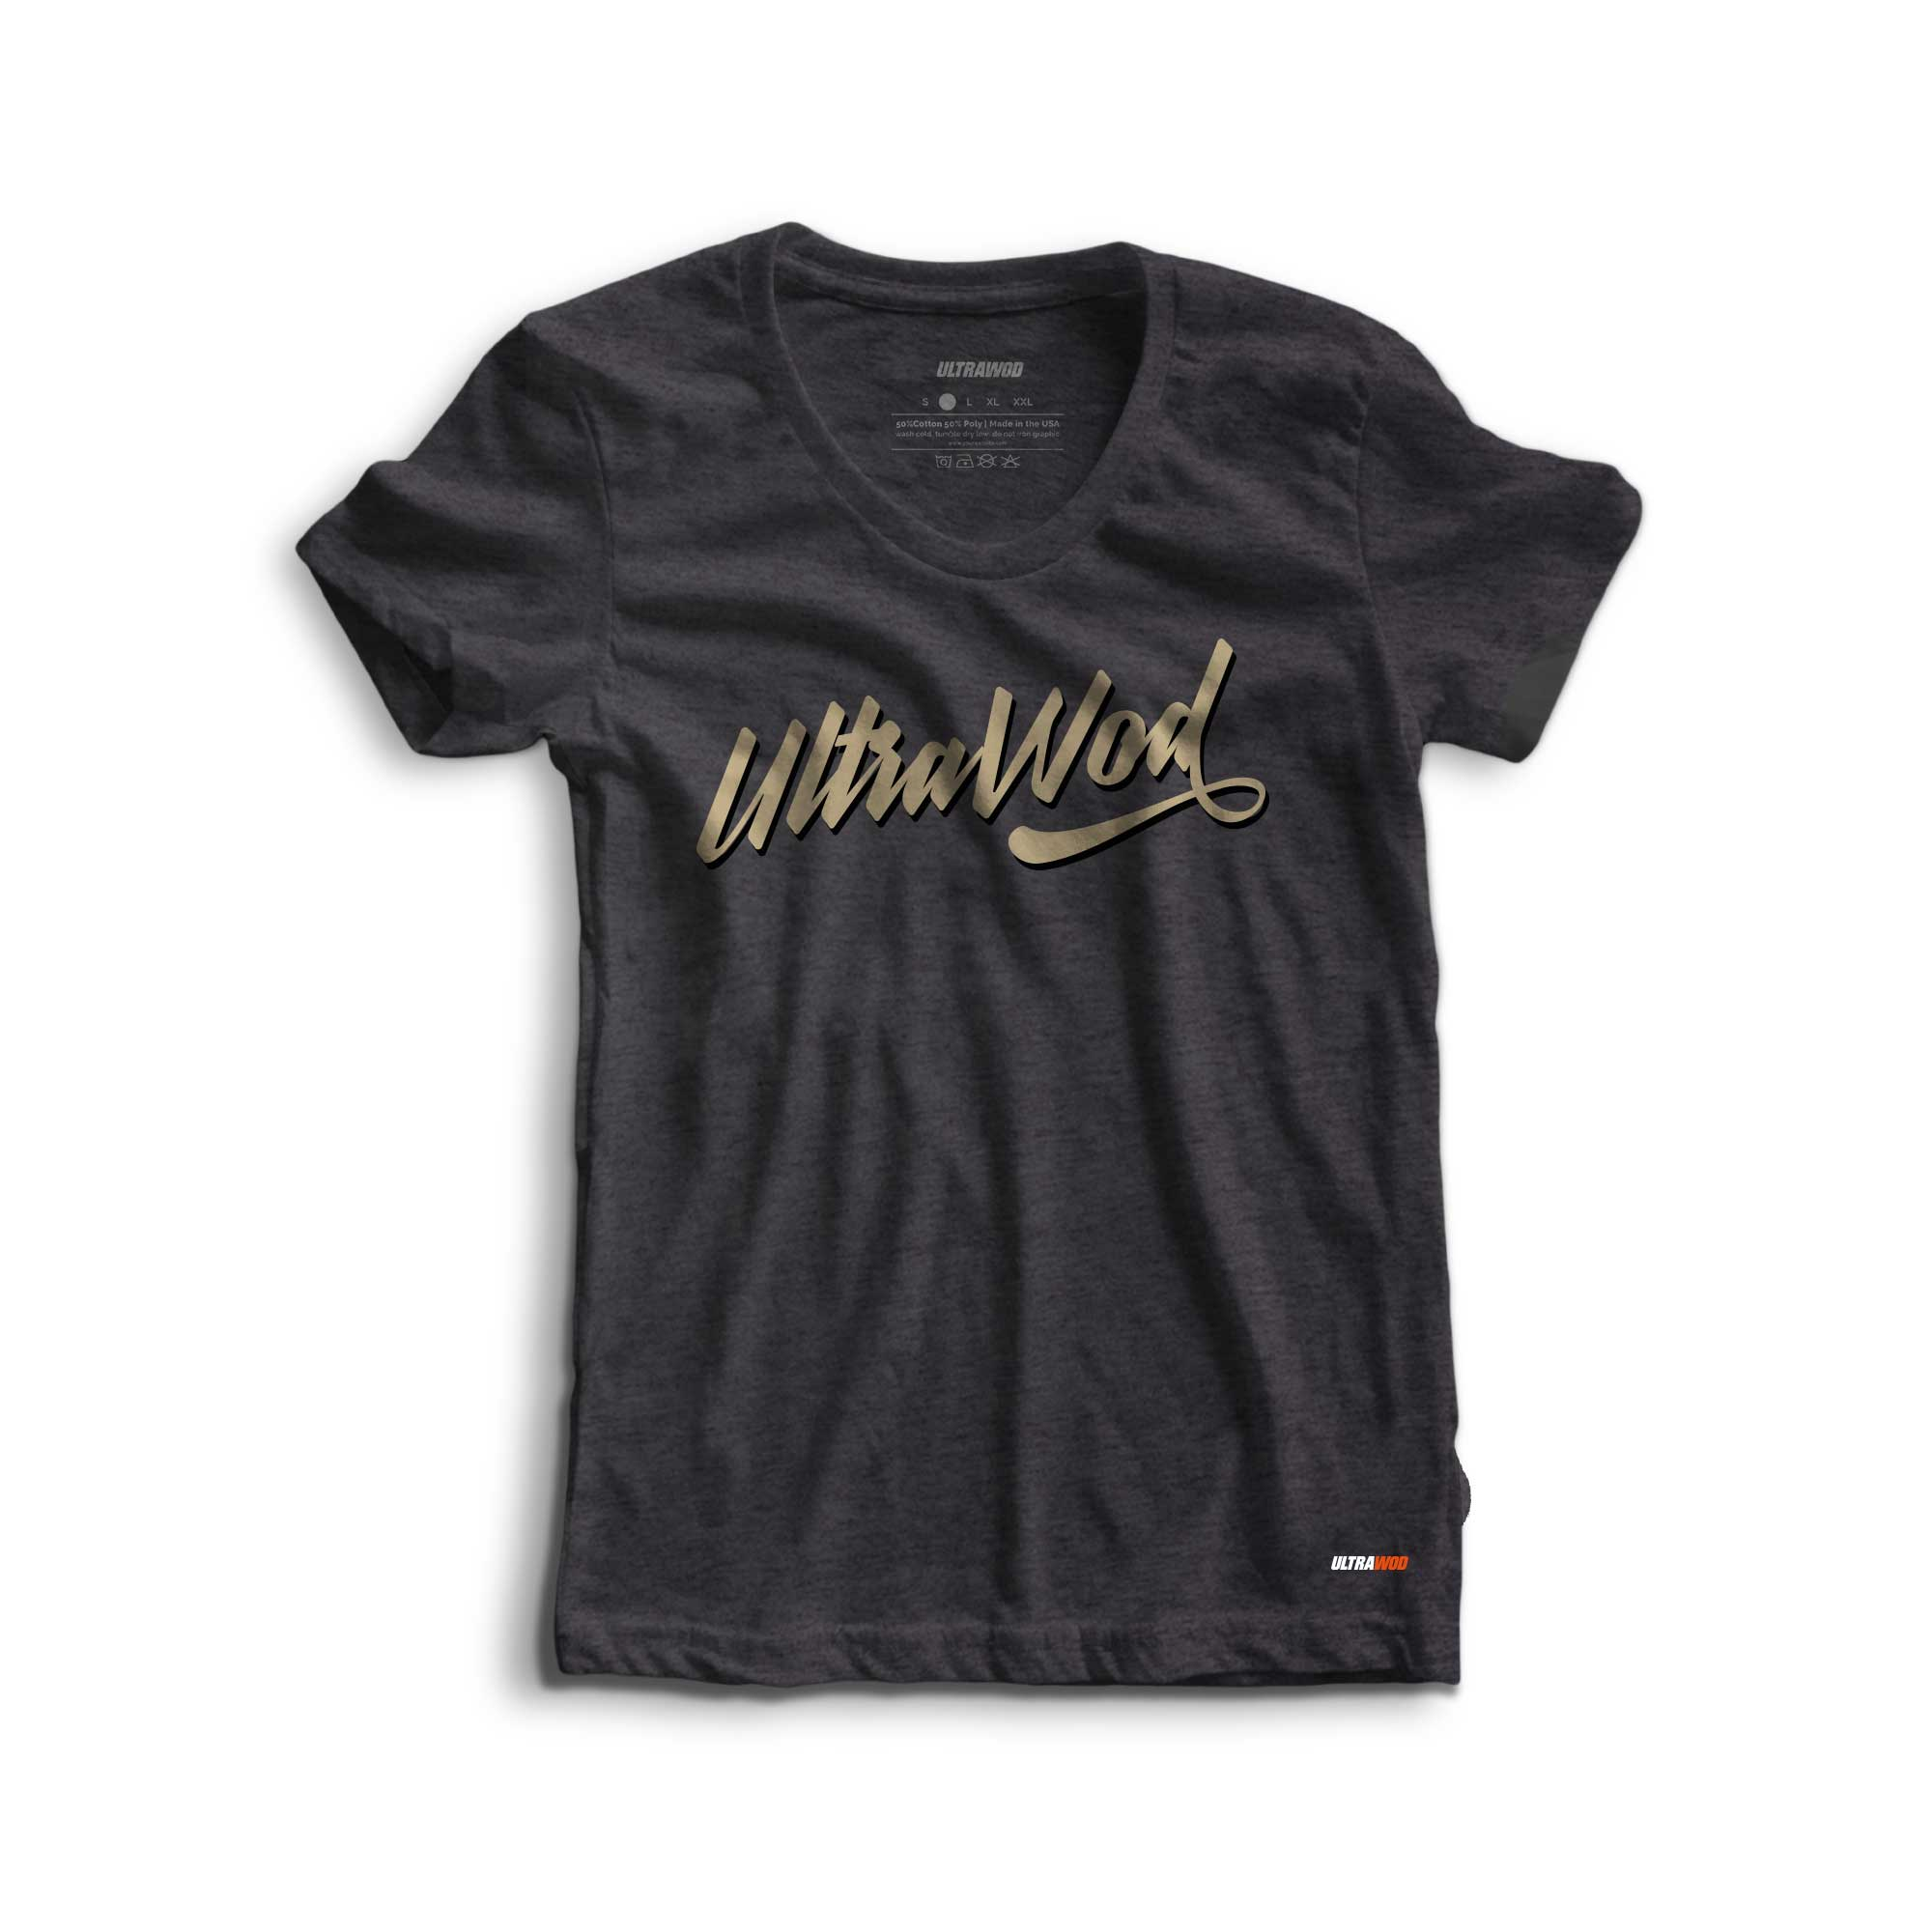 Camiseta UltraWod Vintage Feminina